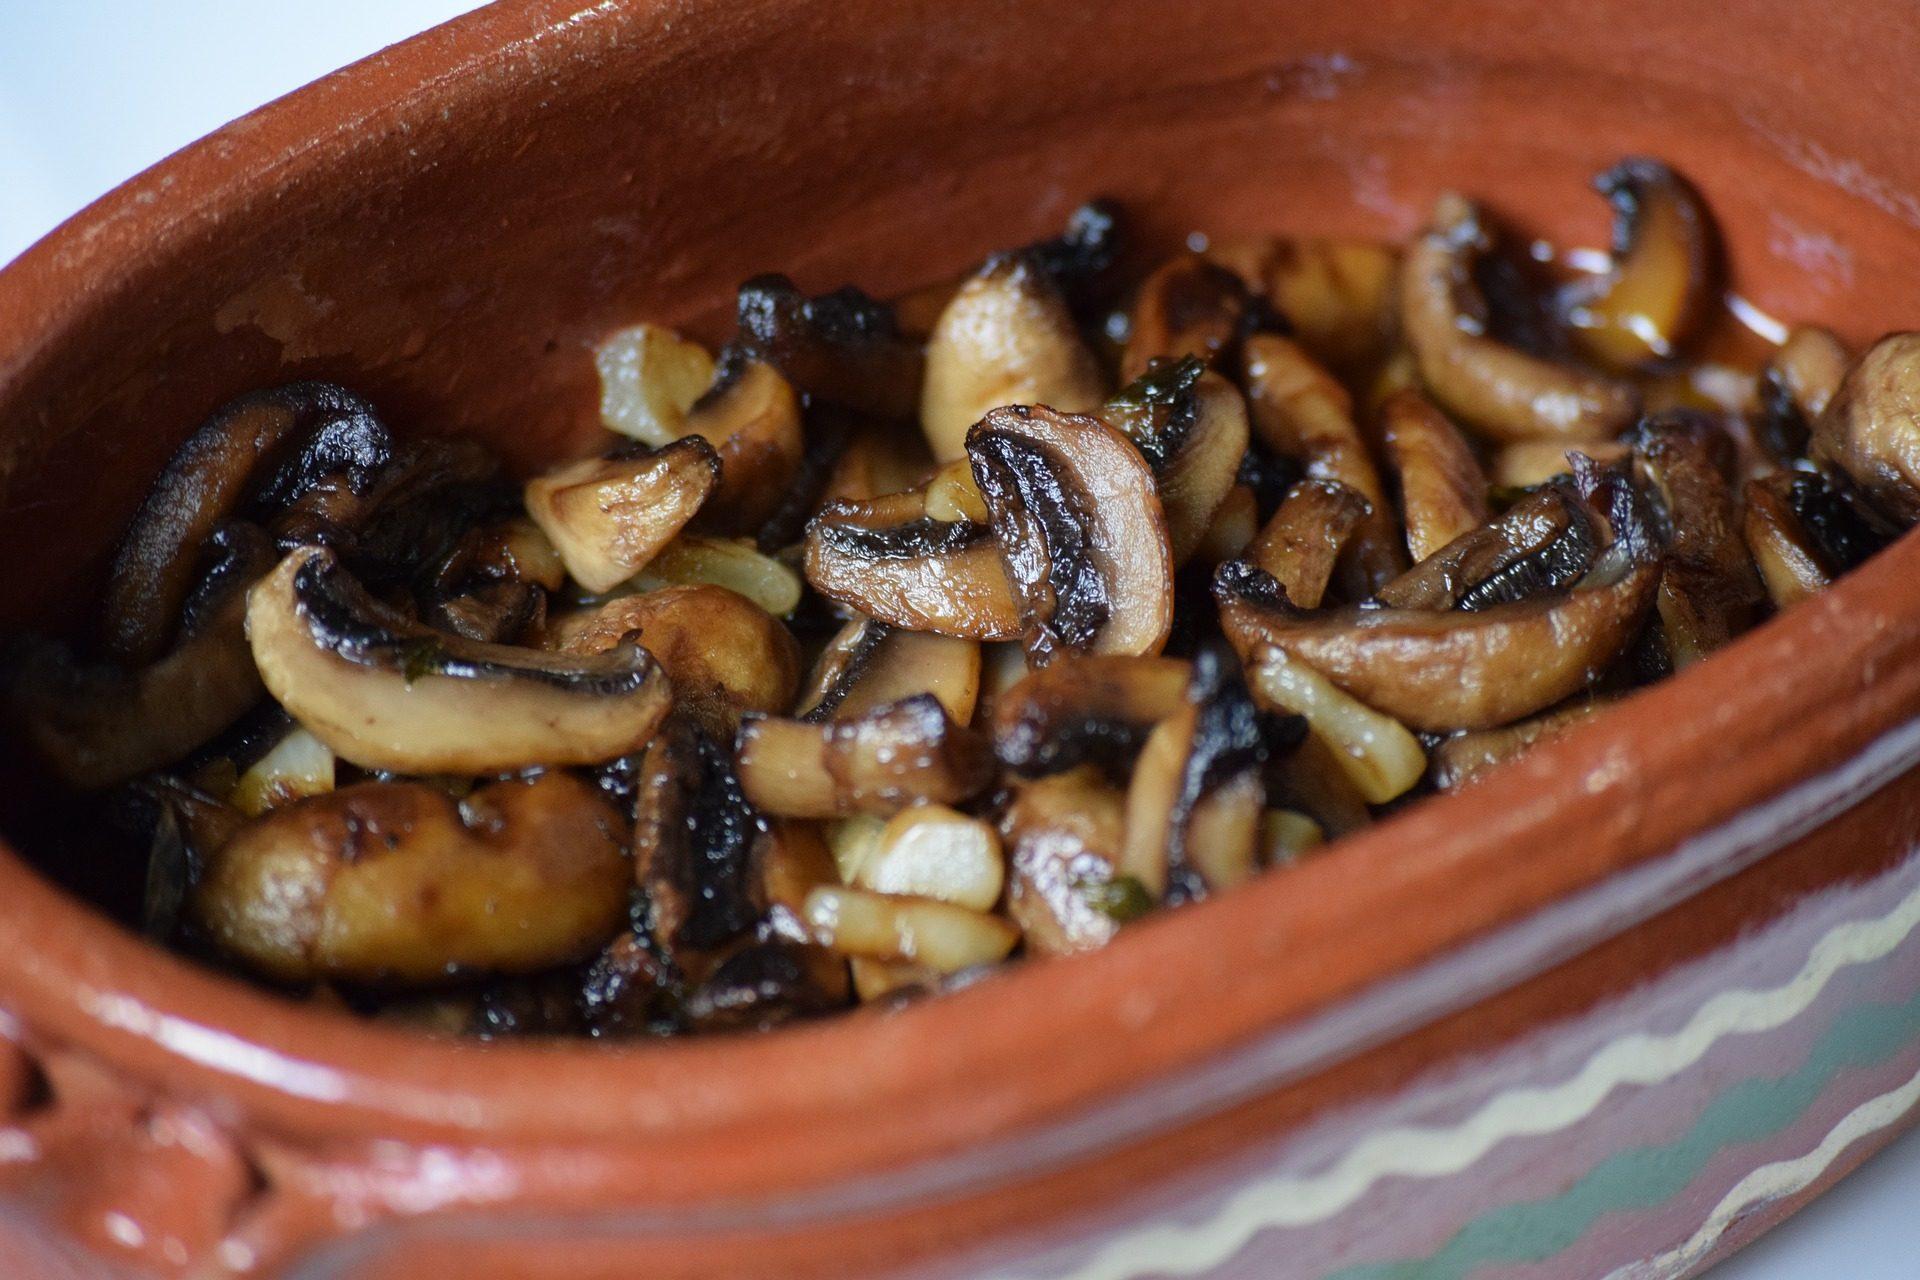 setas, cogumelos, assado, Tigela, lama - Papéis de parede HD - Professor-falken.com